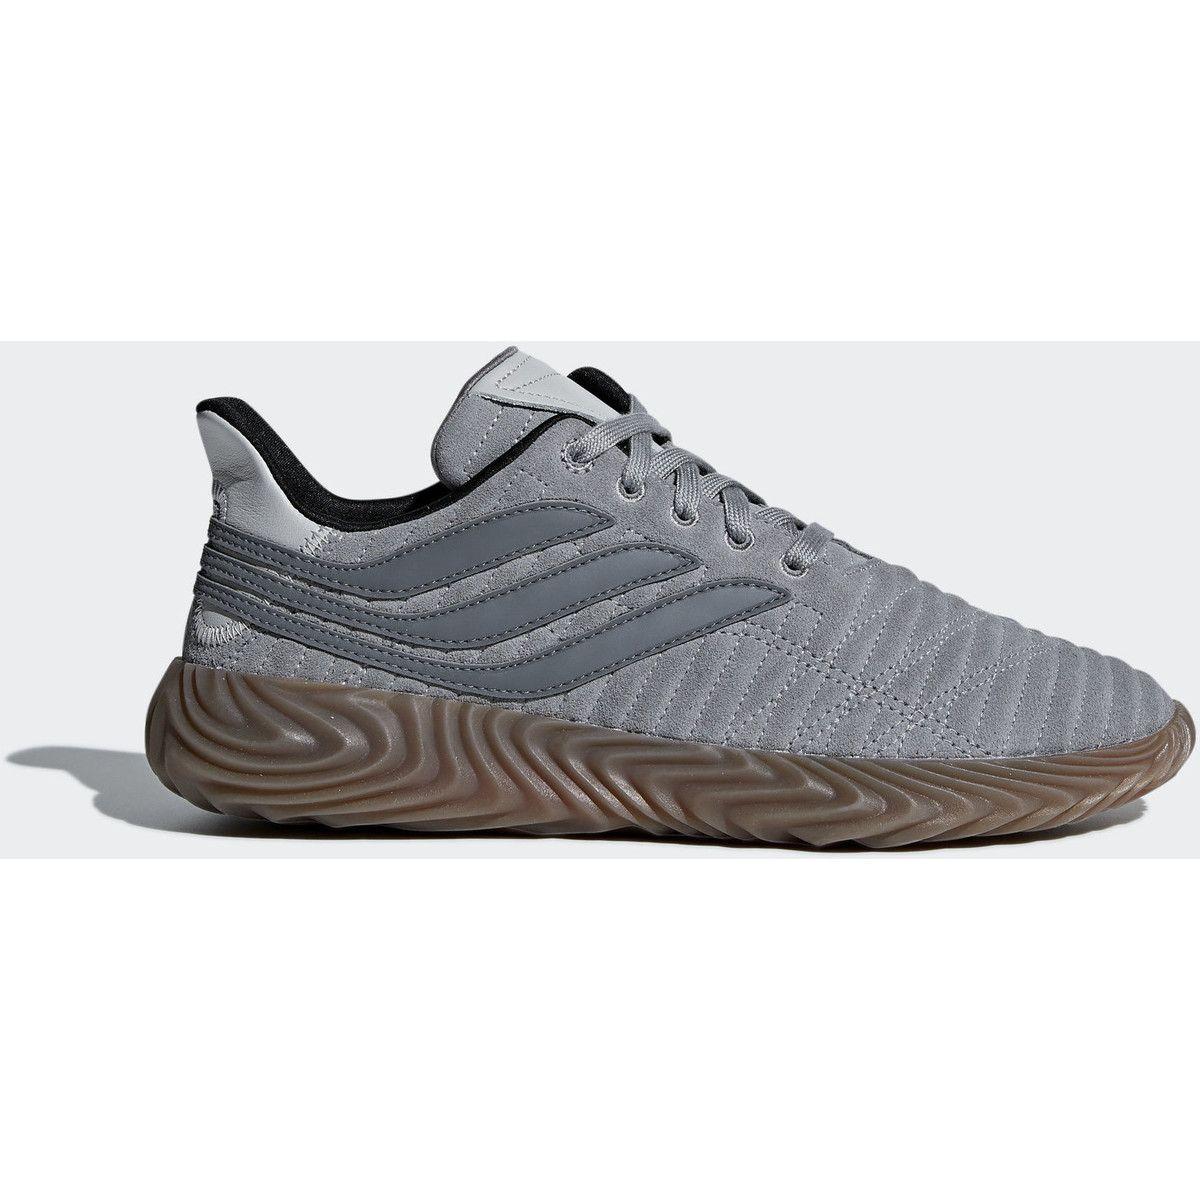 adidas Sobakov Schoenen Lage Sneakers dames. Kleur: Grijs ...